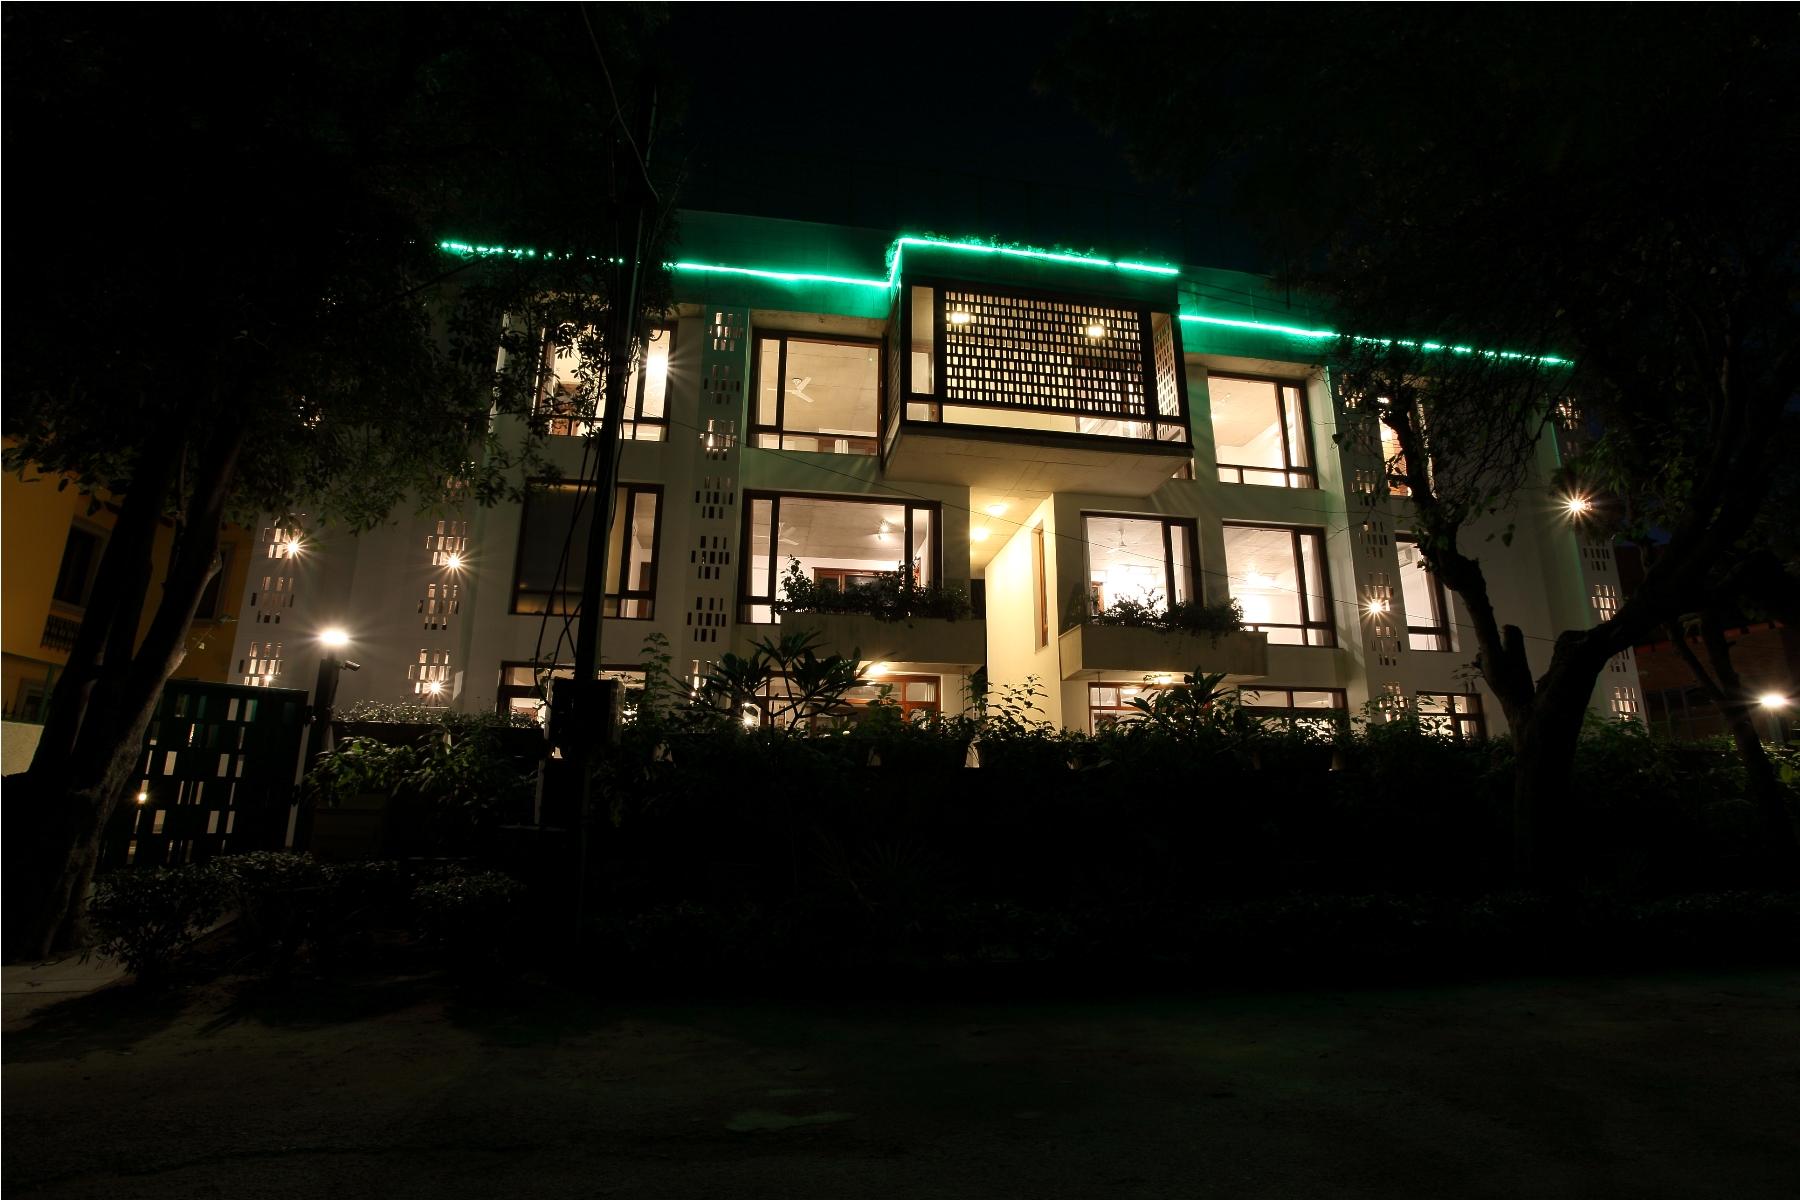 Multi-Family Home for Sale at DLF City Phase 1- Hari ki Sarai Bungalow DLF City Phase 1 Sector 26 Gurgaon, Haryana, 122002 India